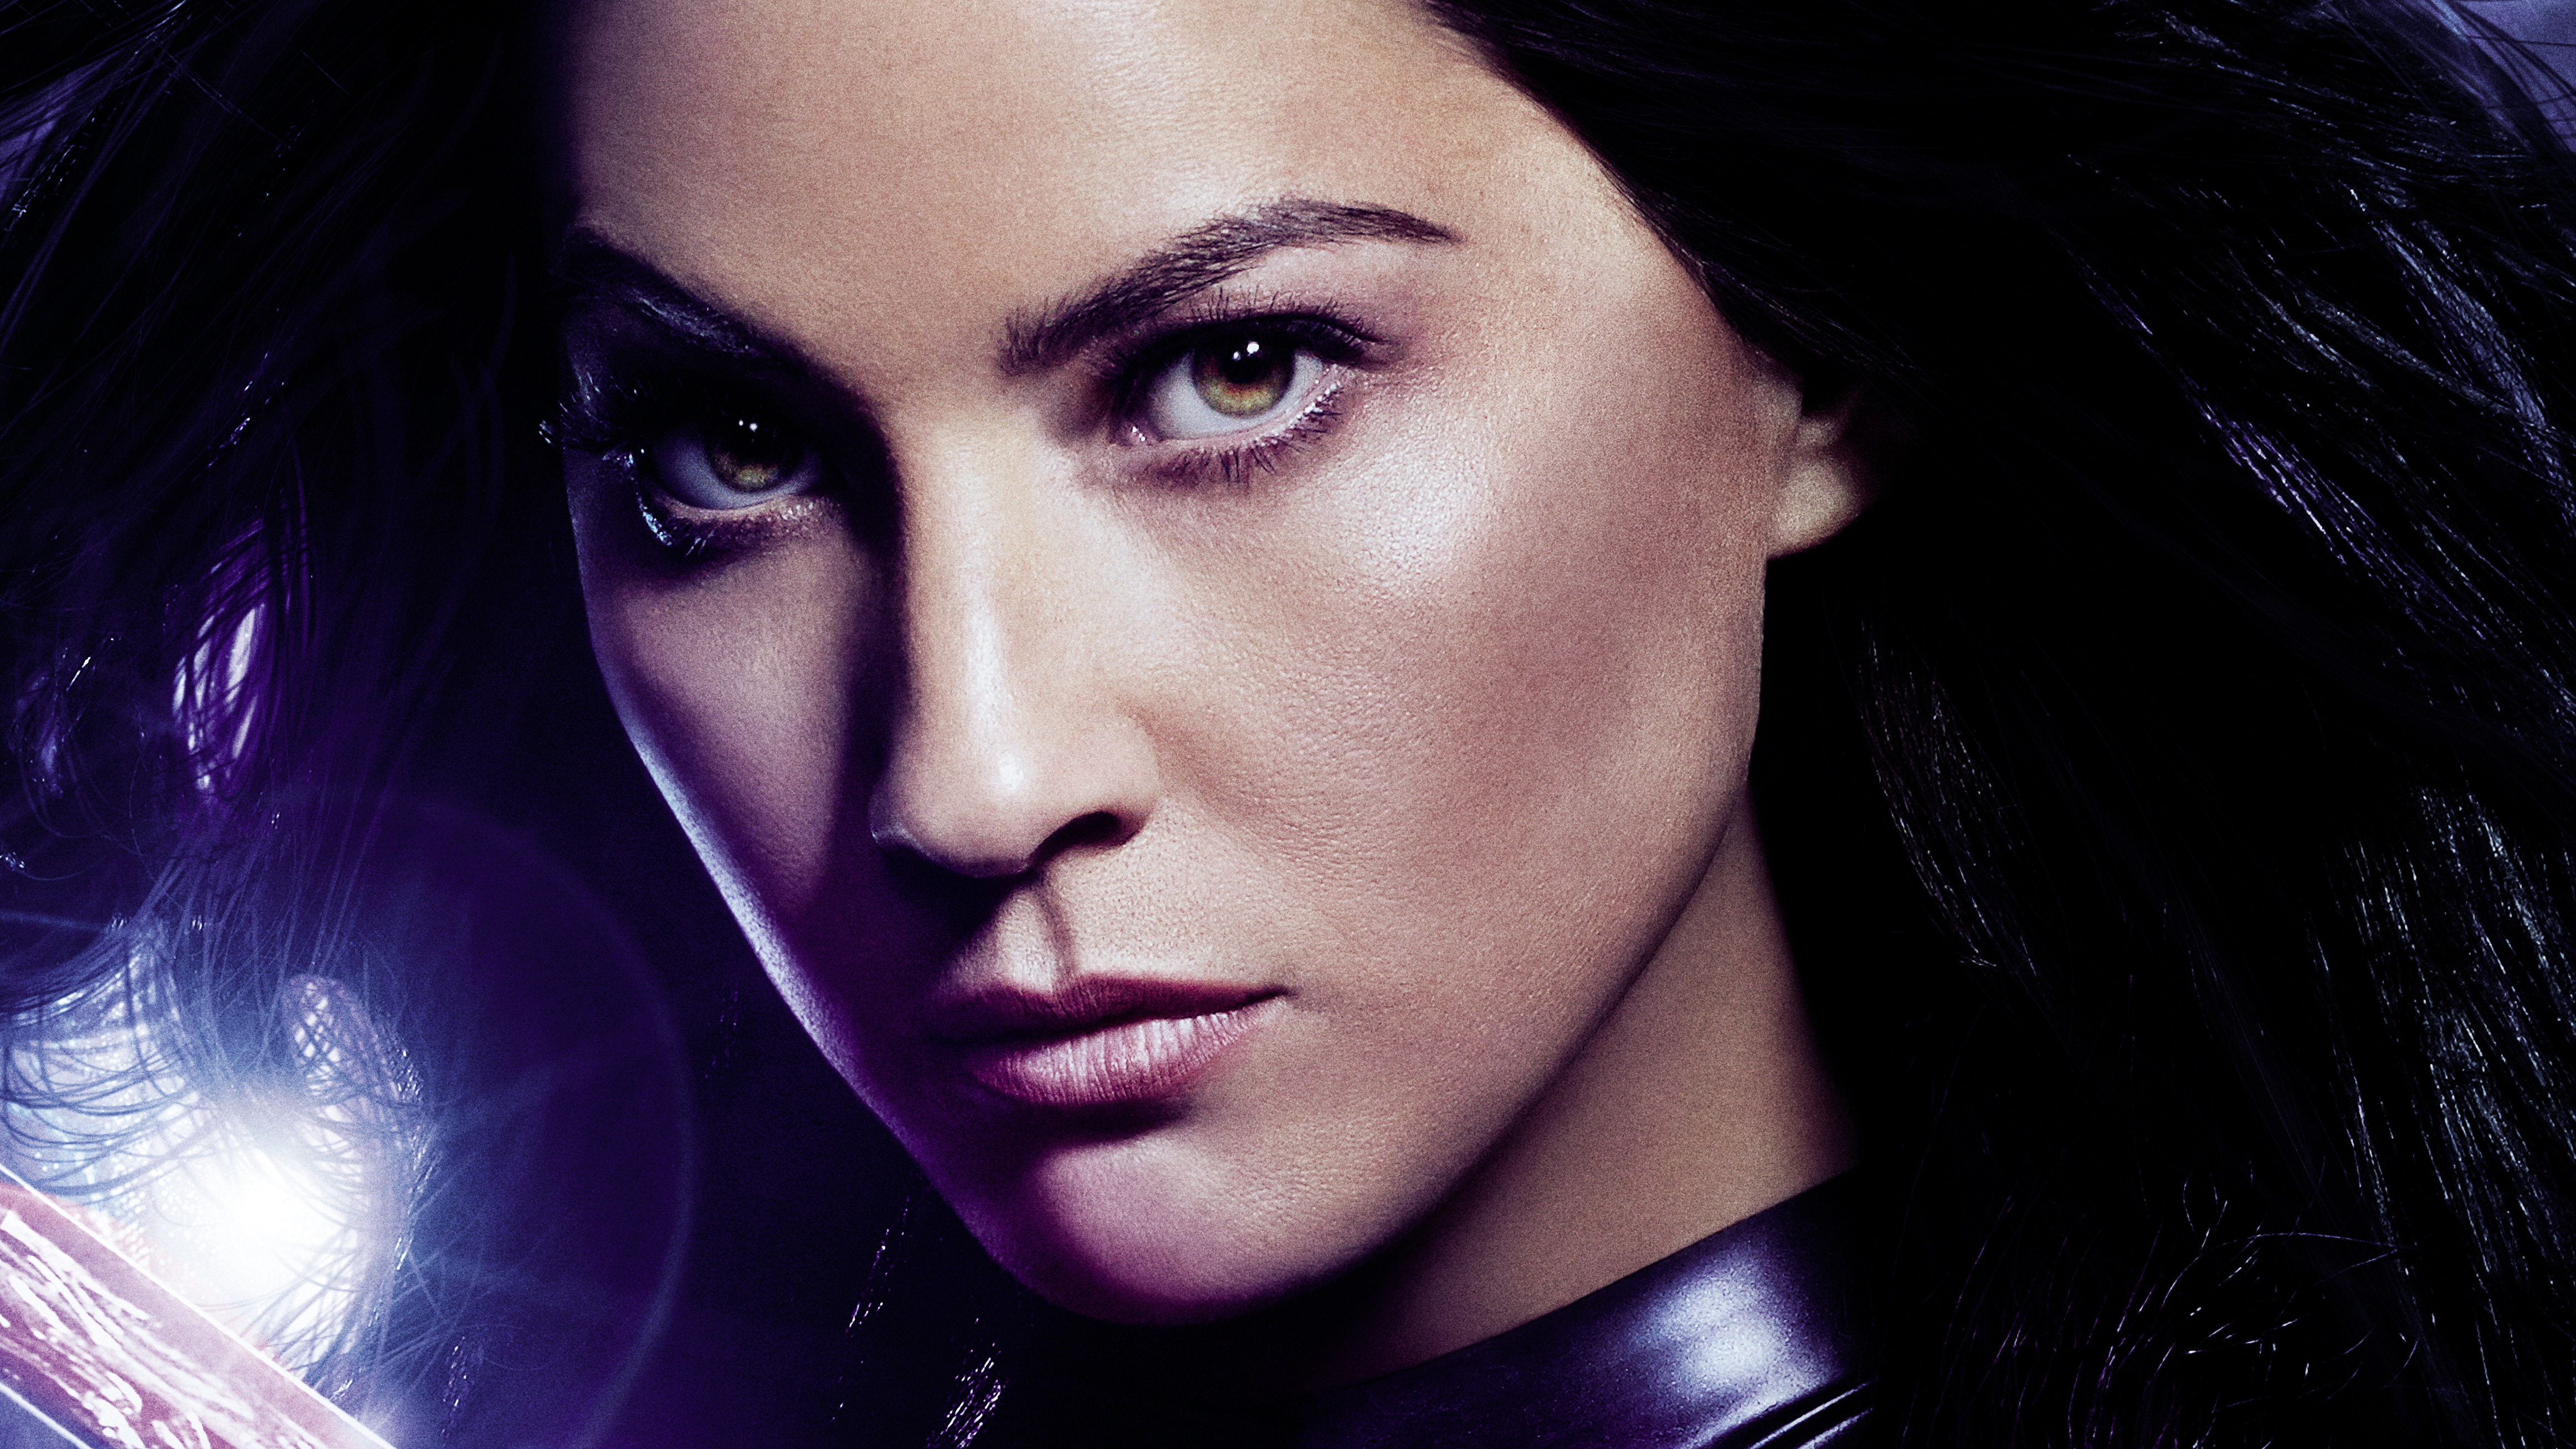 Psylocke In X Men Apocalypse Hd Movies 4k Wallpapers Images